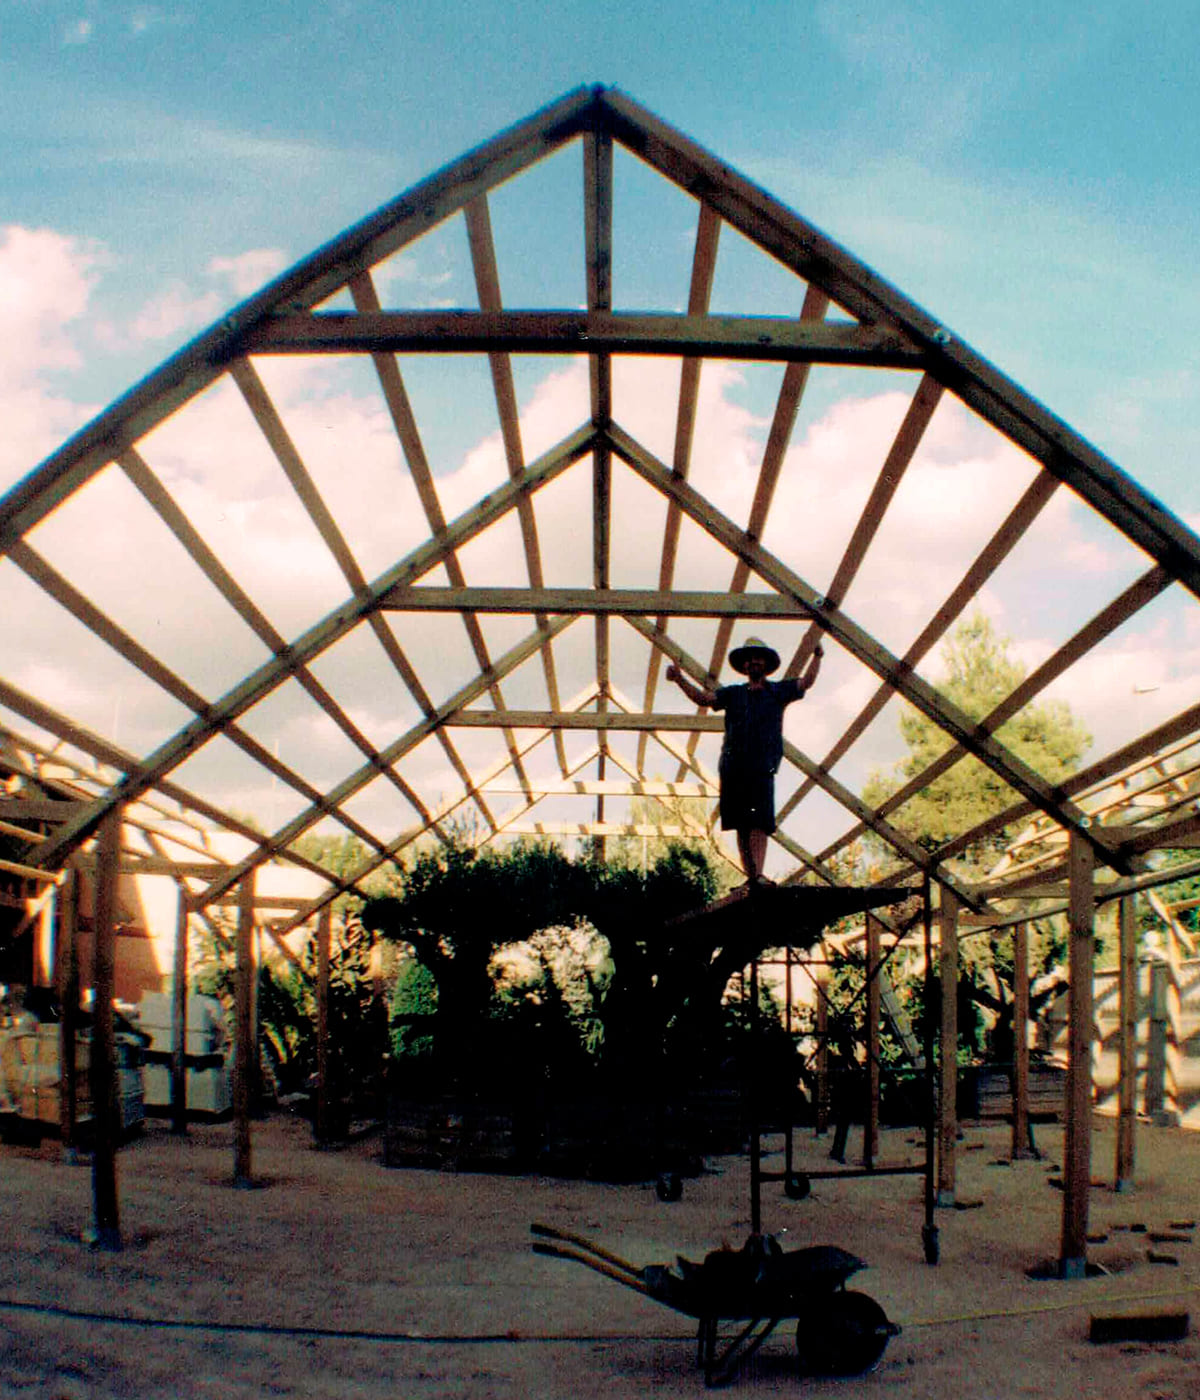 construccion-invernadero-madera-artesanal-01_HIDROJARDIN-Bañeres